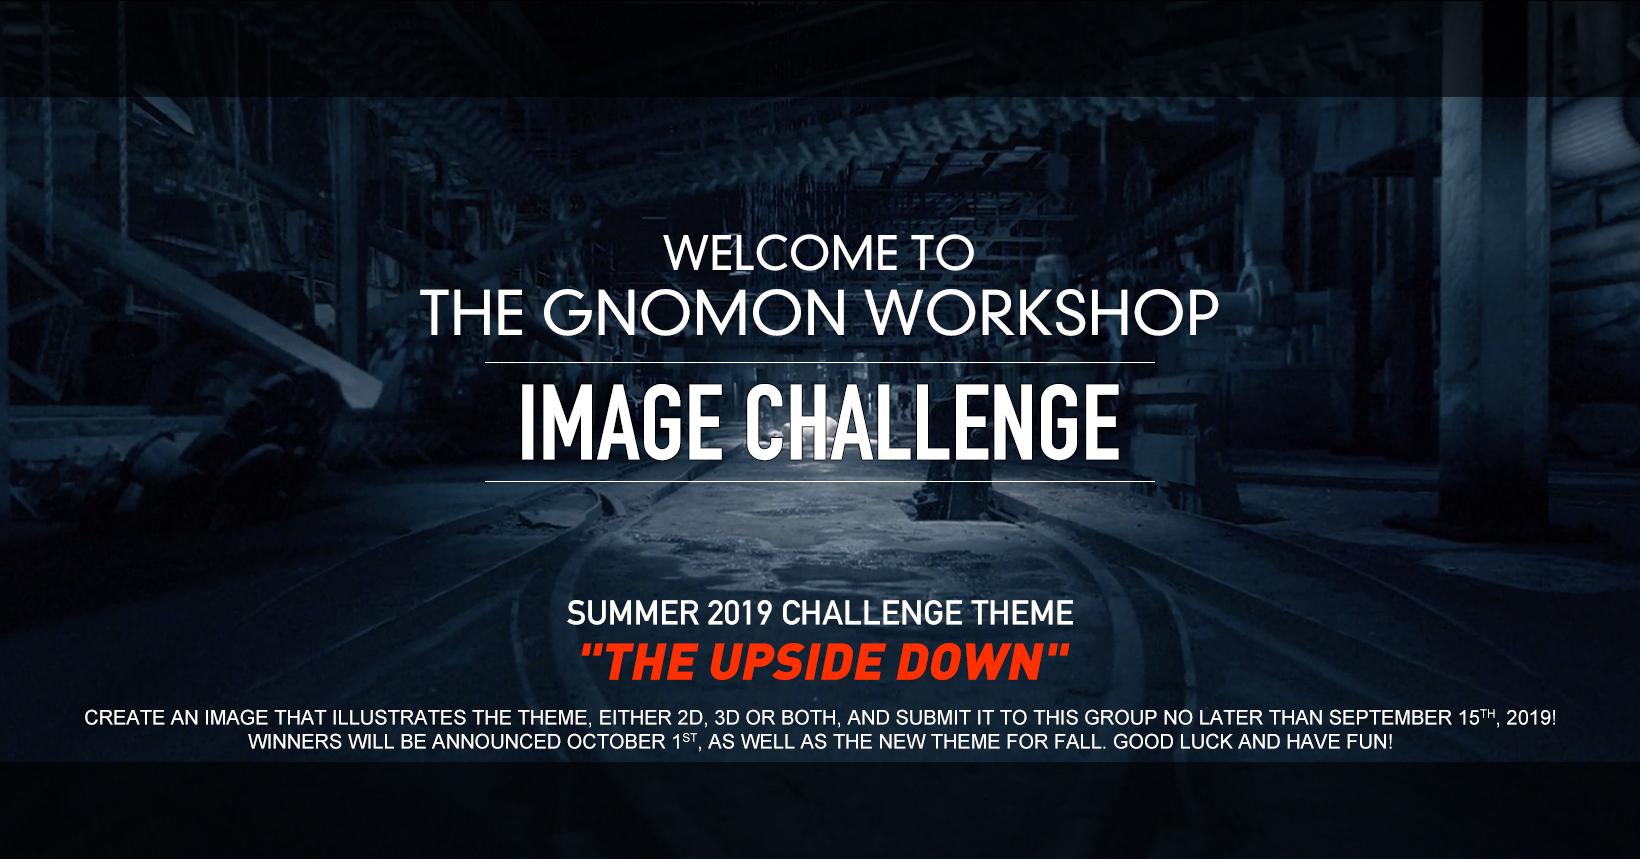 The Gnomon Workshop Image Challenge